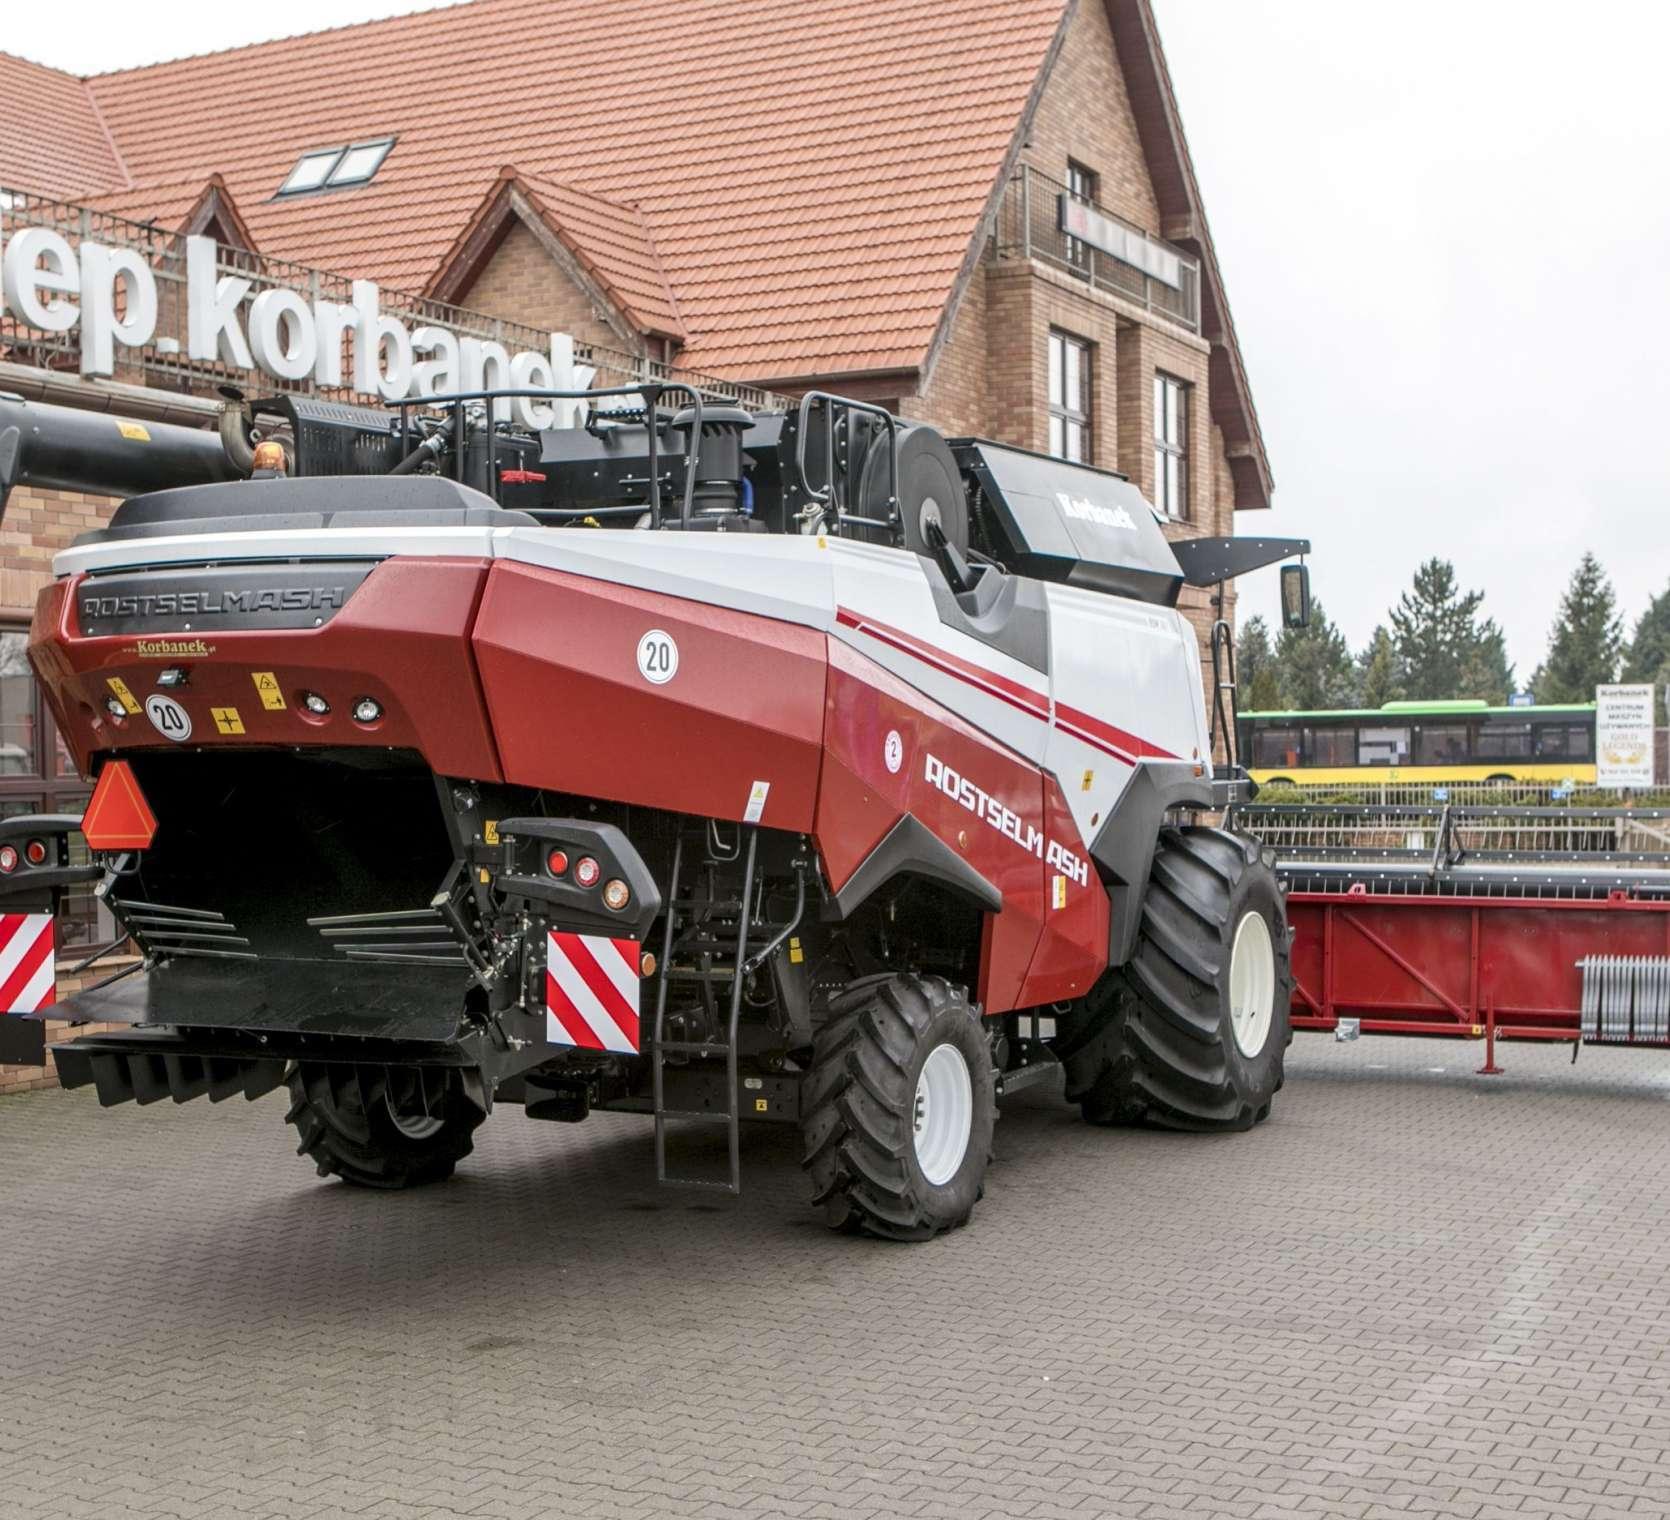 Kombajn zbożowy Rostselmash RSM 161 heder 7 metrów promocja korbanek.pl